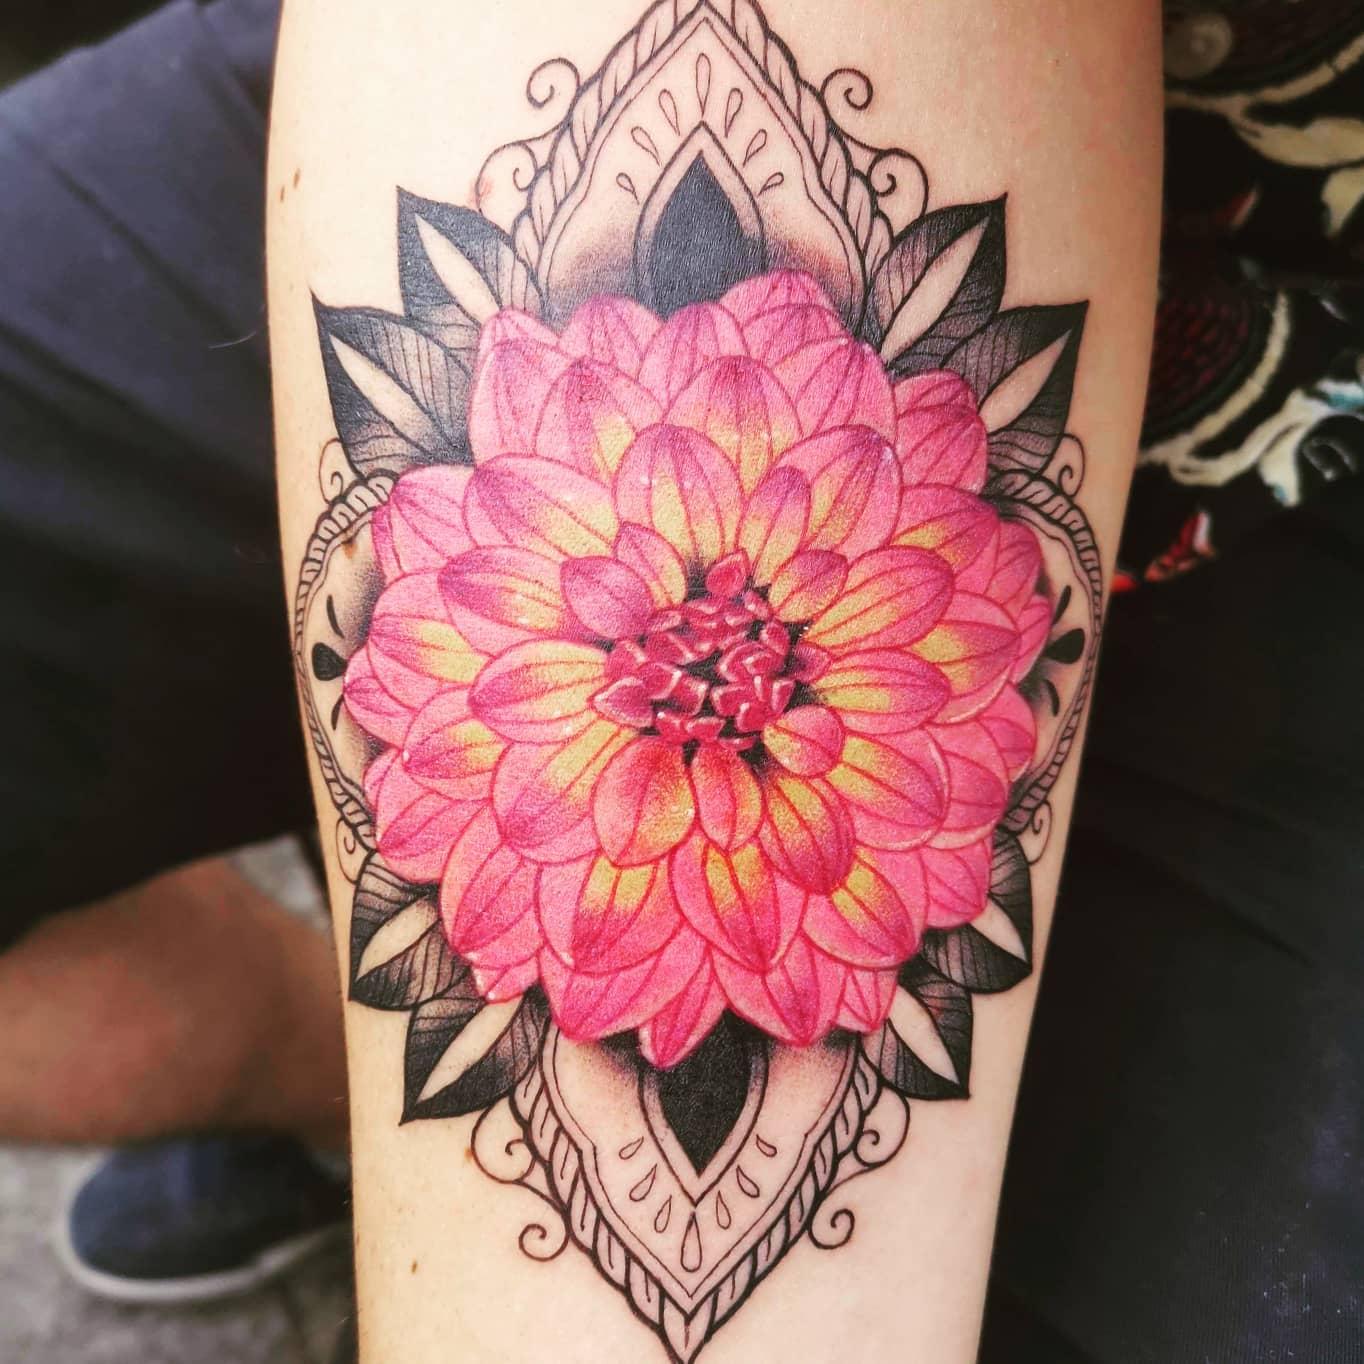 Pink Dahlia Tattoo -flipthompson94